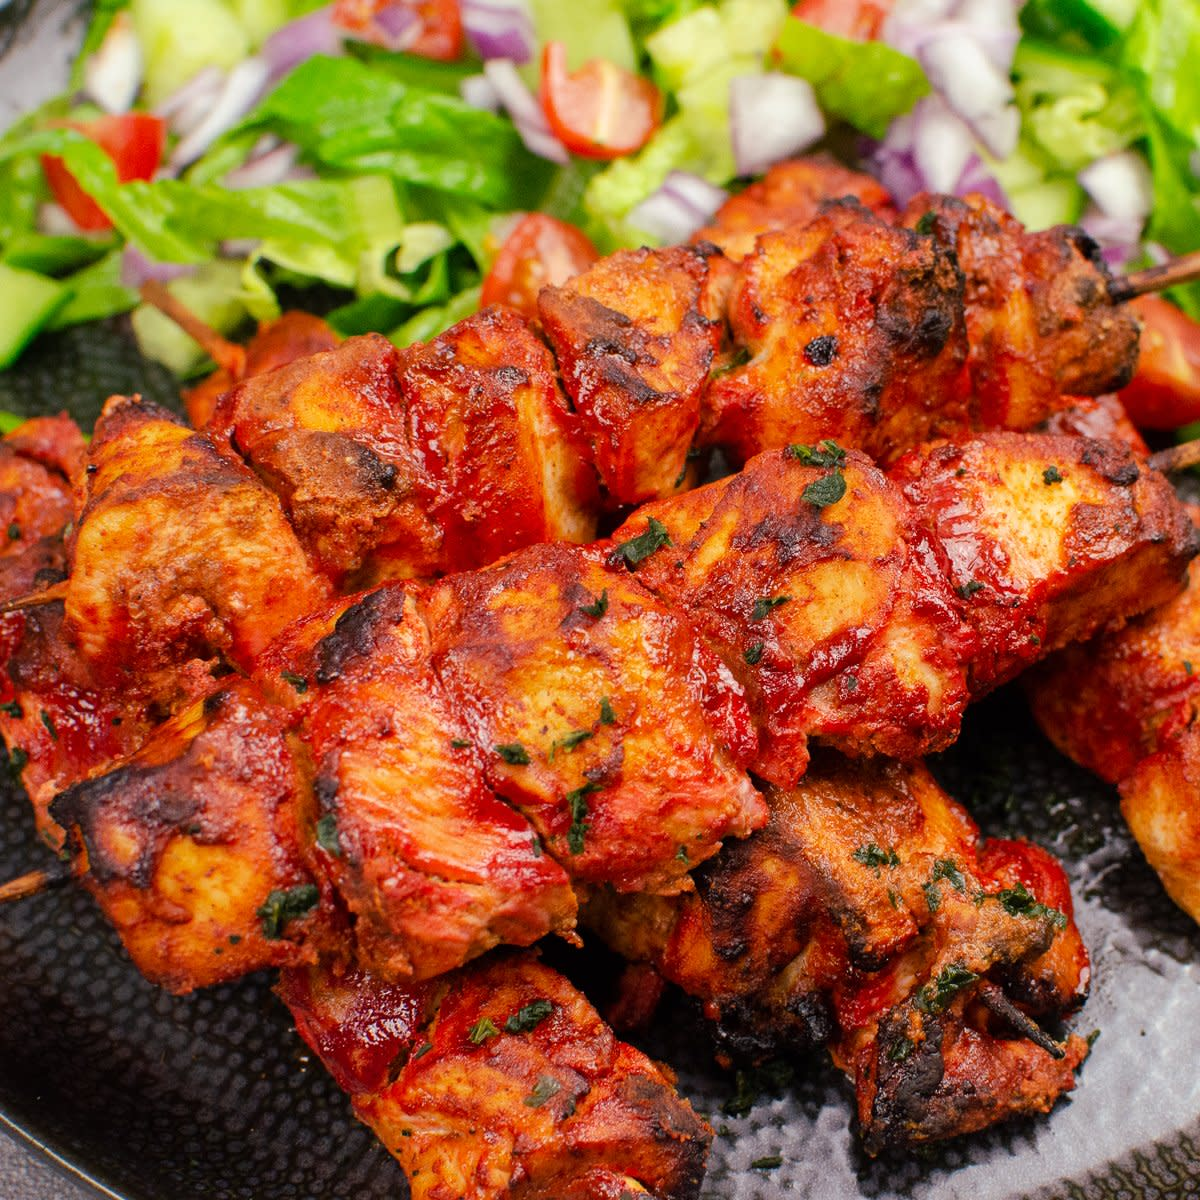 Traditional tandoori chicken tikka is red